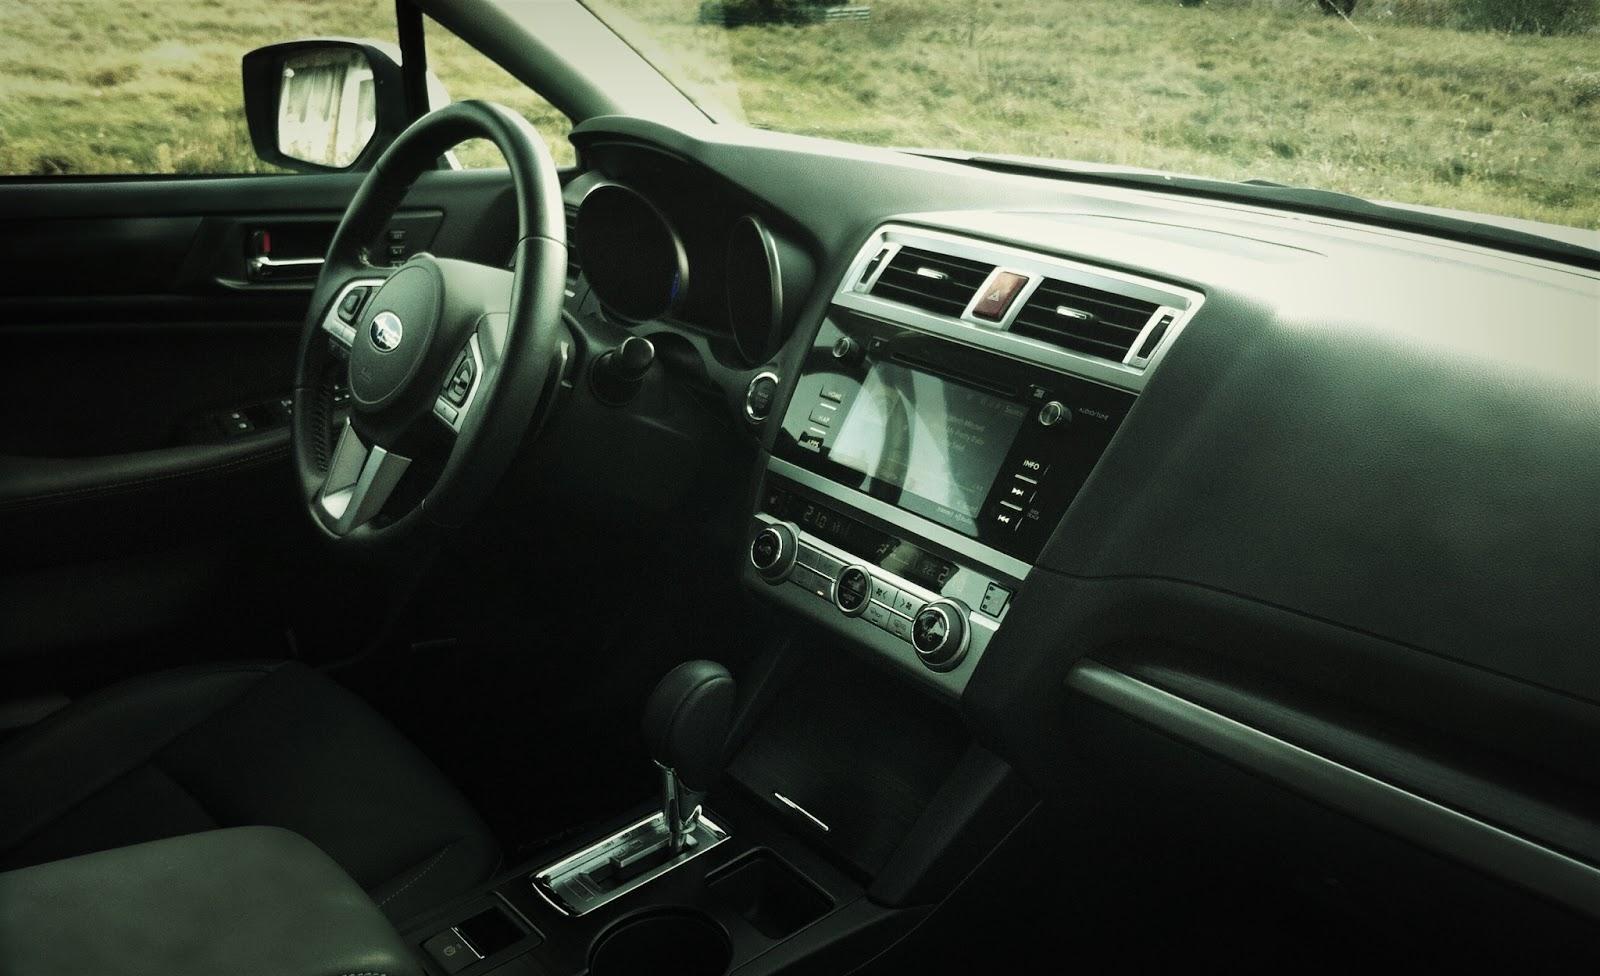 2015 Subaru Legacy 3.6R Limited Tech package